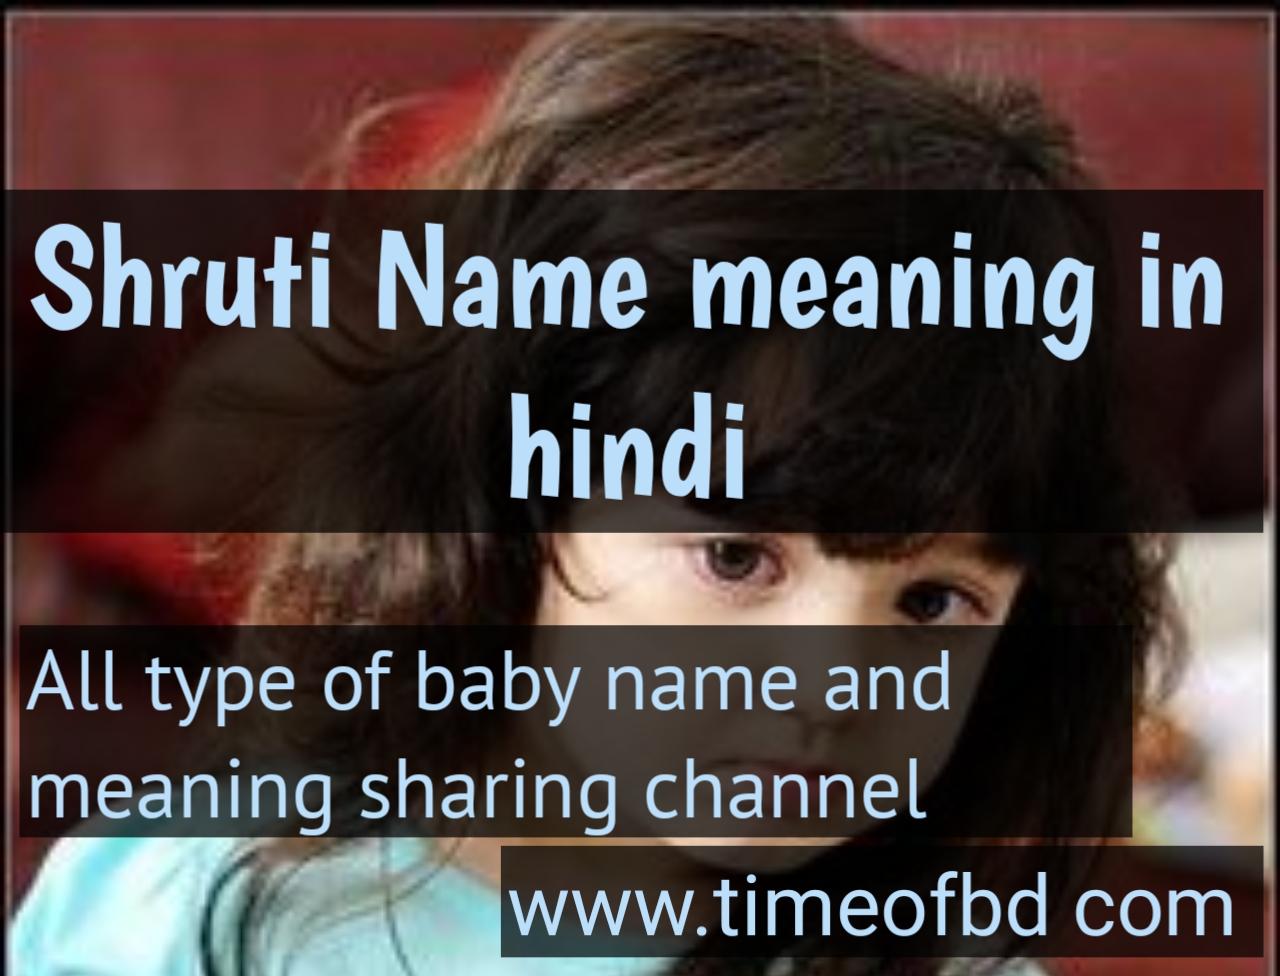 shruti name meaning in hindi, shruti ka meaning ,shruti meaning in hindi dictioanry,meaning of shruti  in hindi